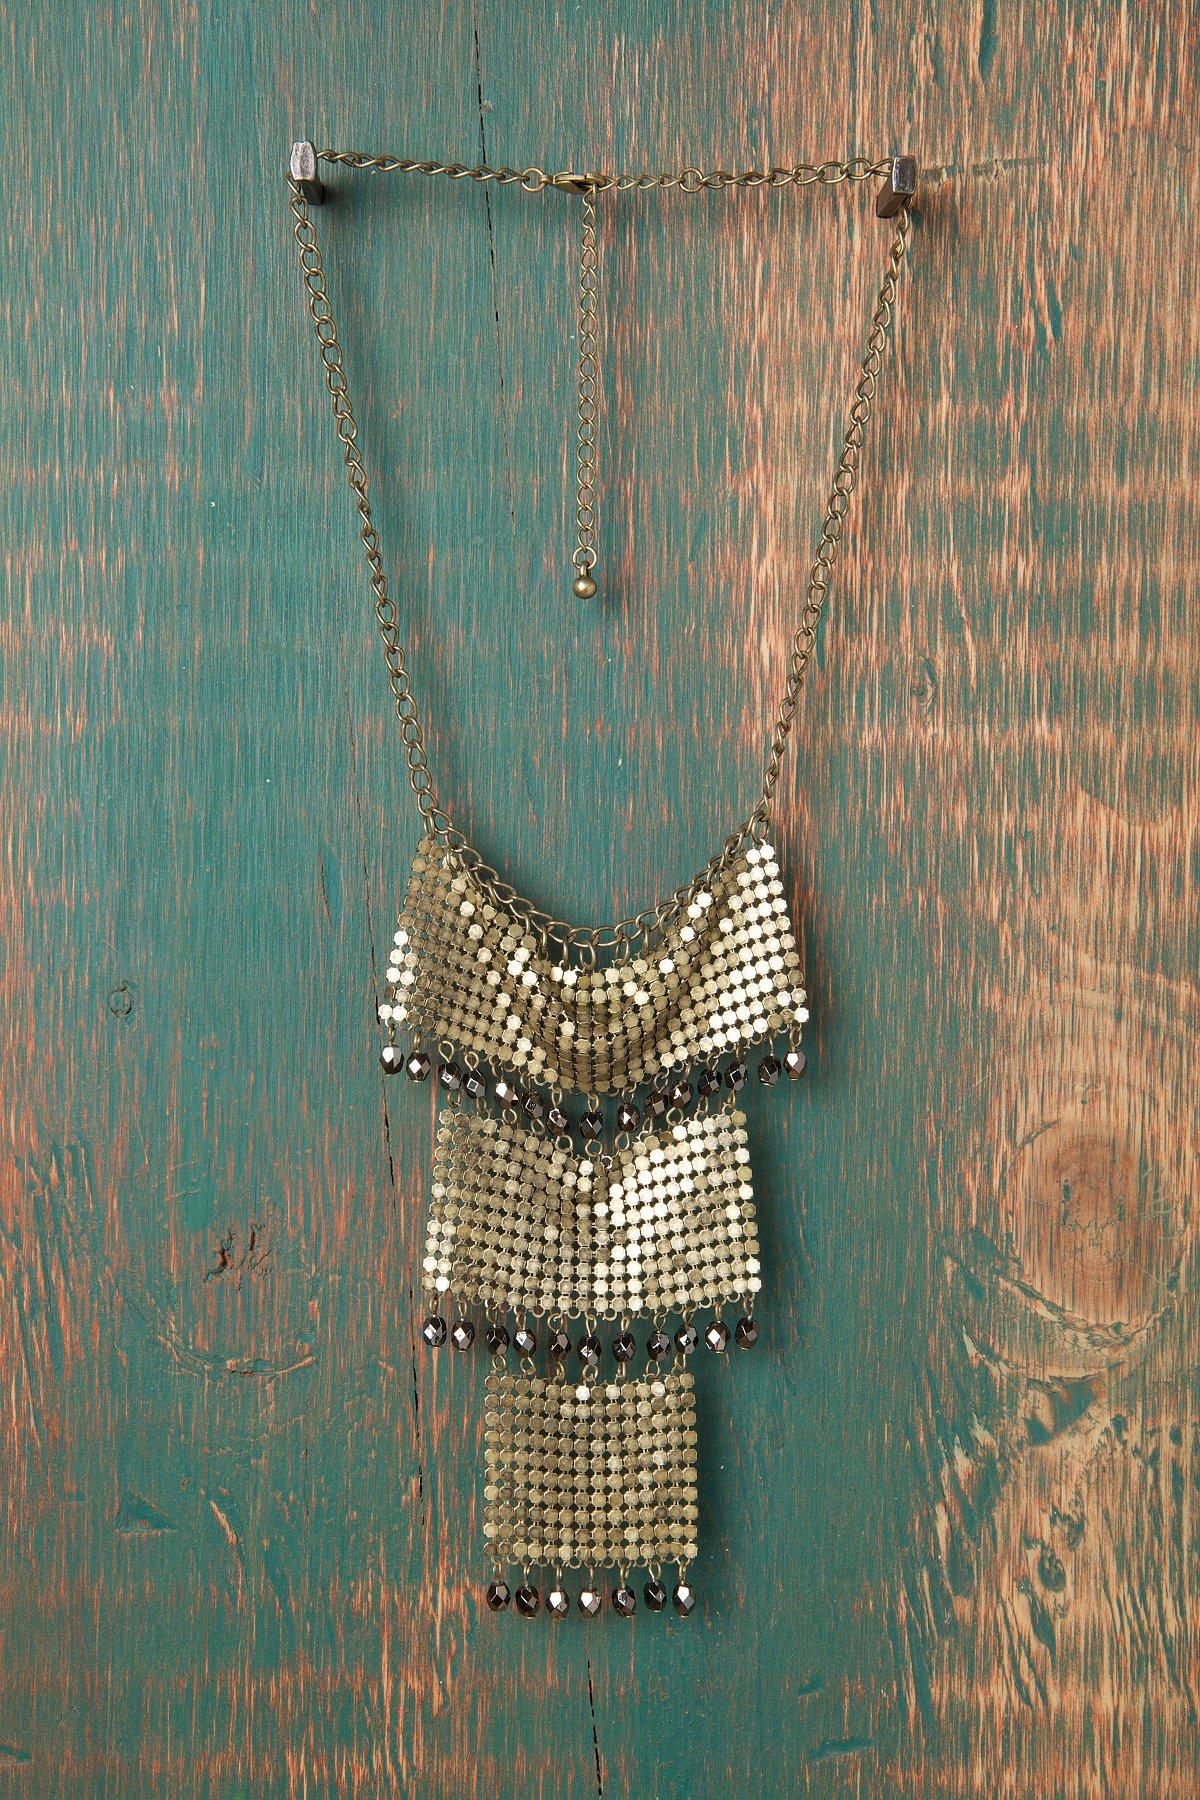 Victoria Tiered Necklace